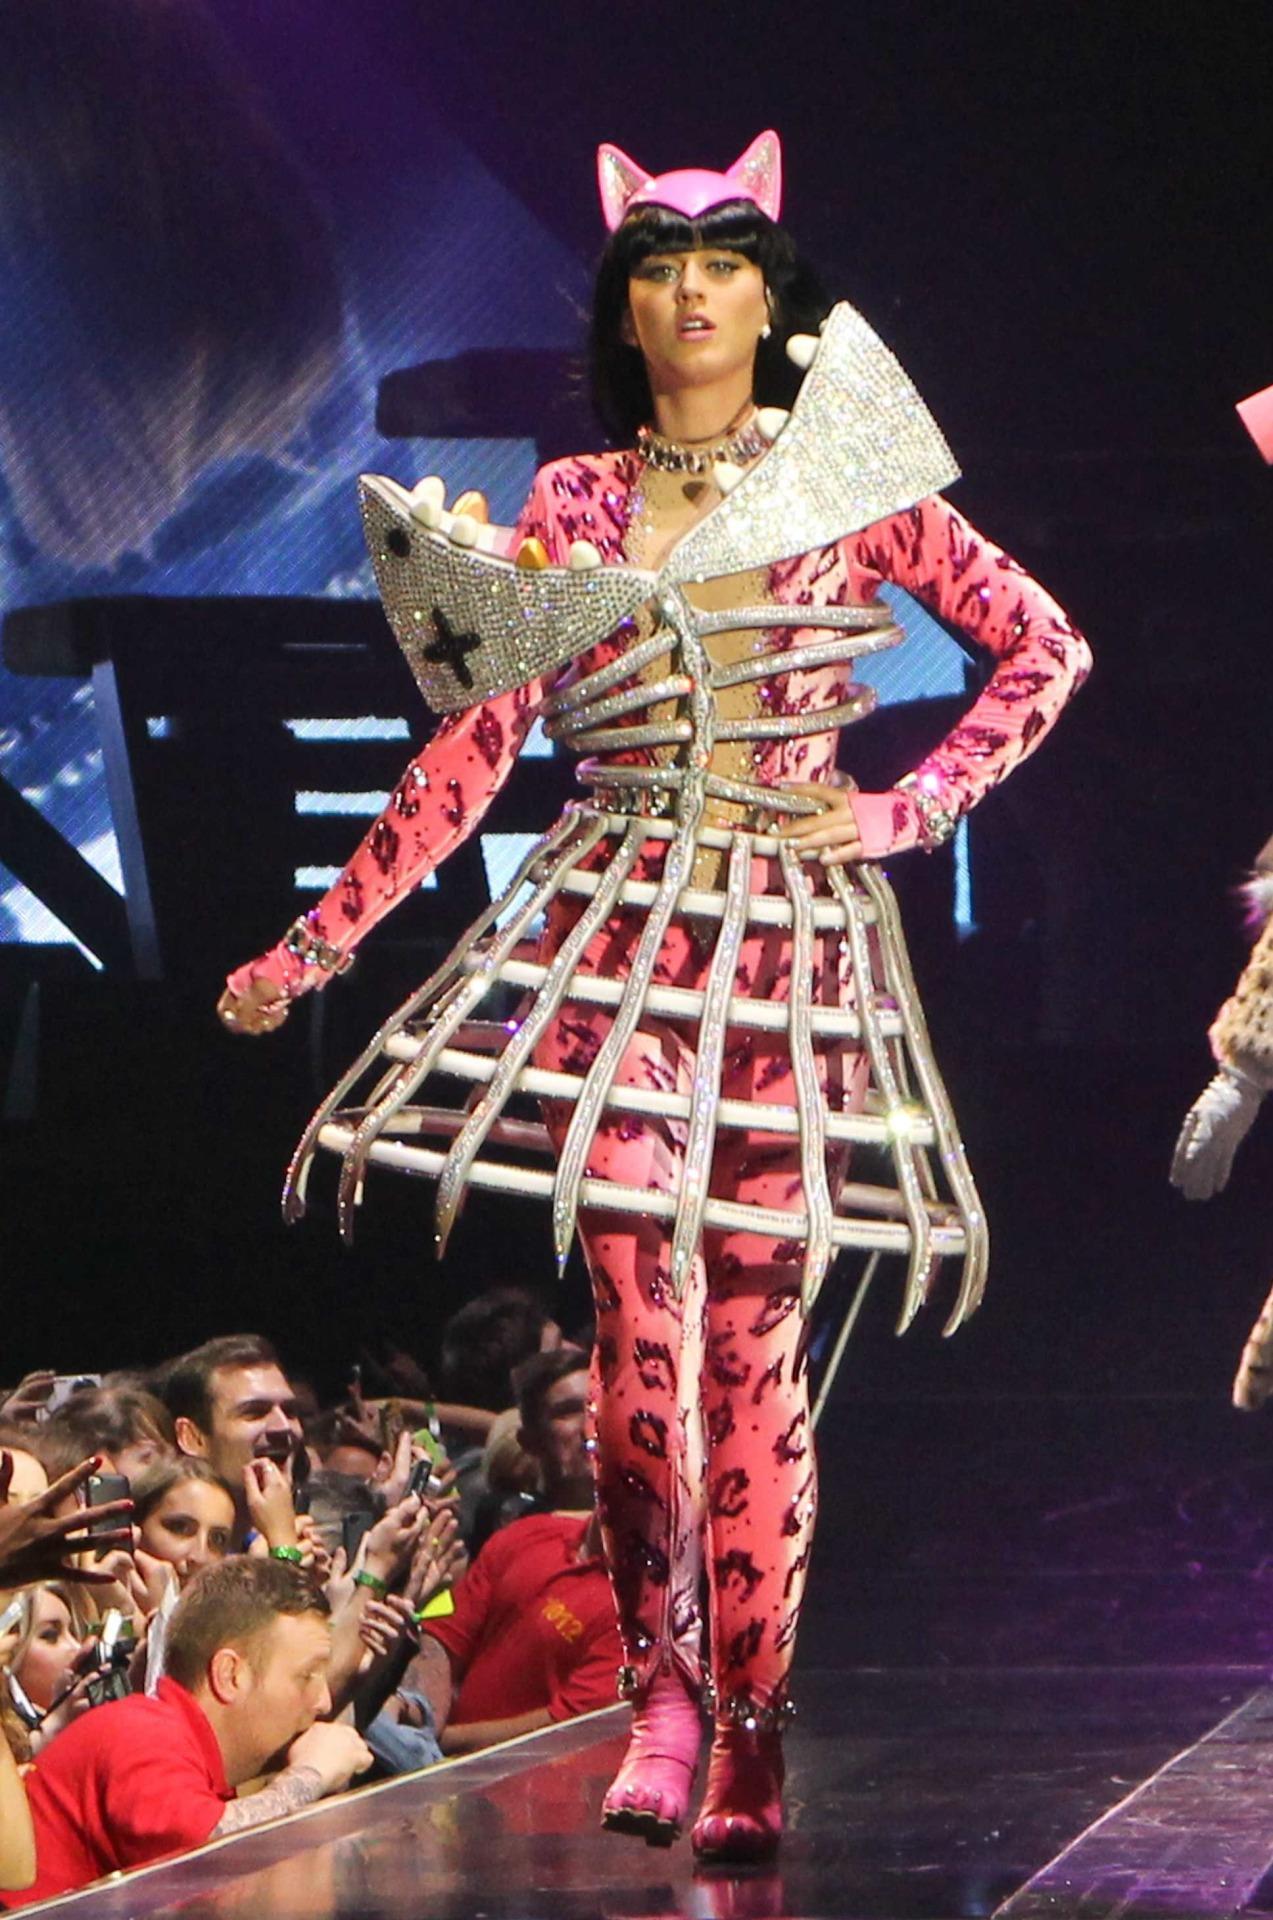 Katy Perry >> The Prismatic World Tour Tumblr_n58y1pycJY1qc70kwo5_1280